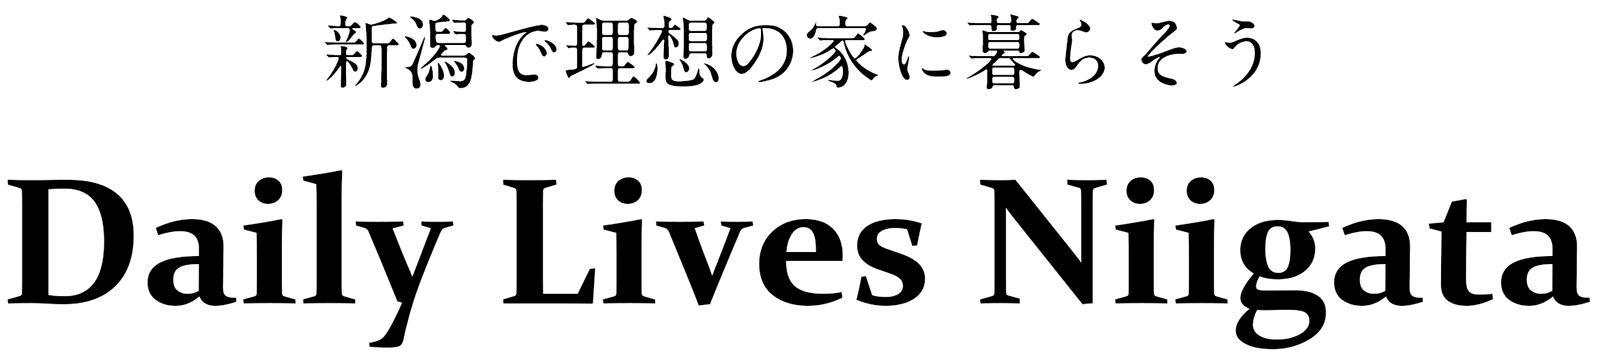 Daily Lives Niigata